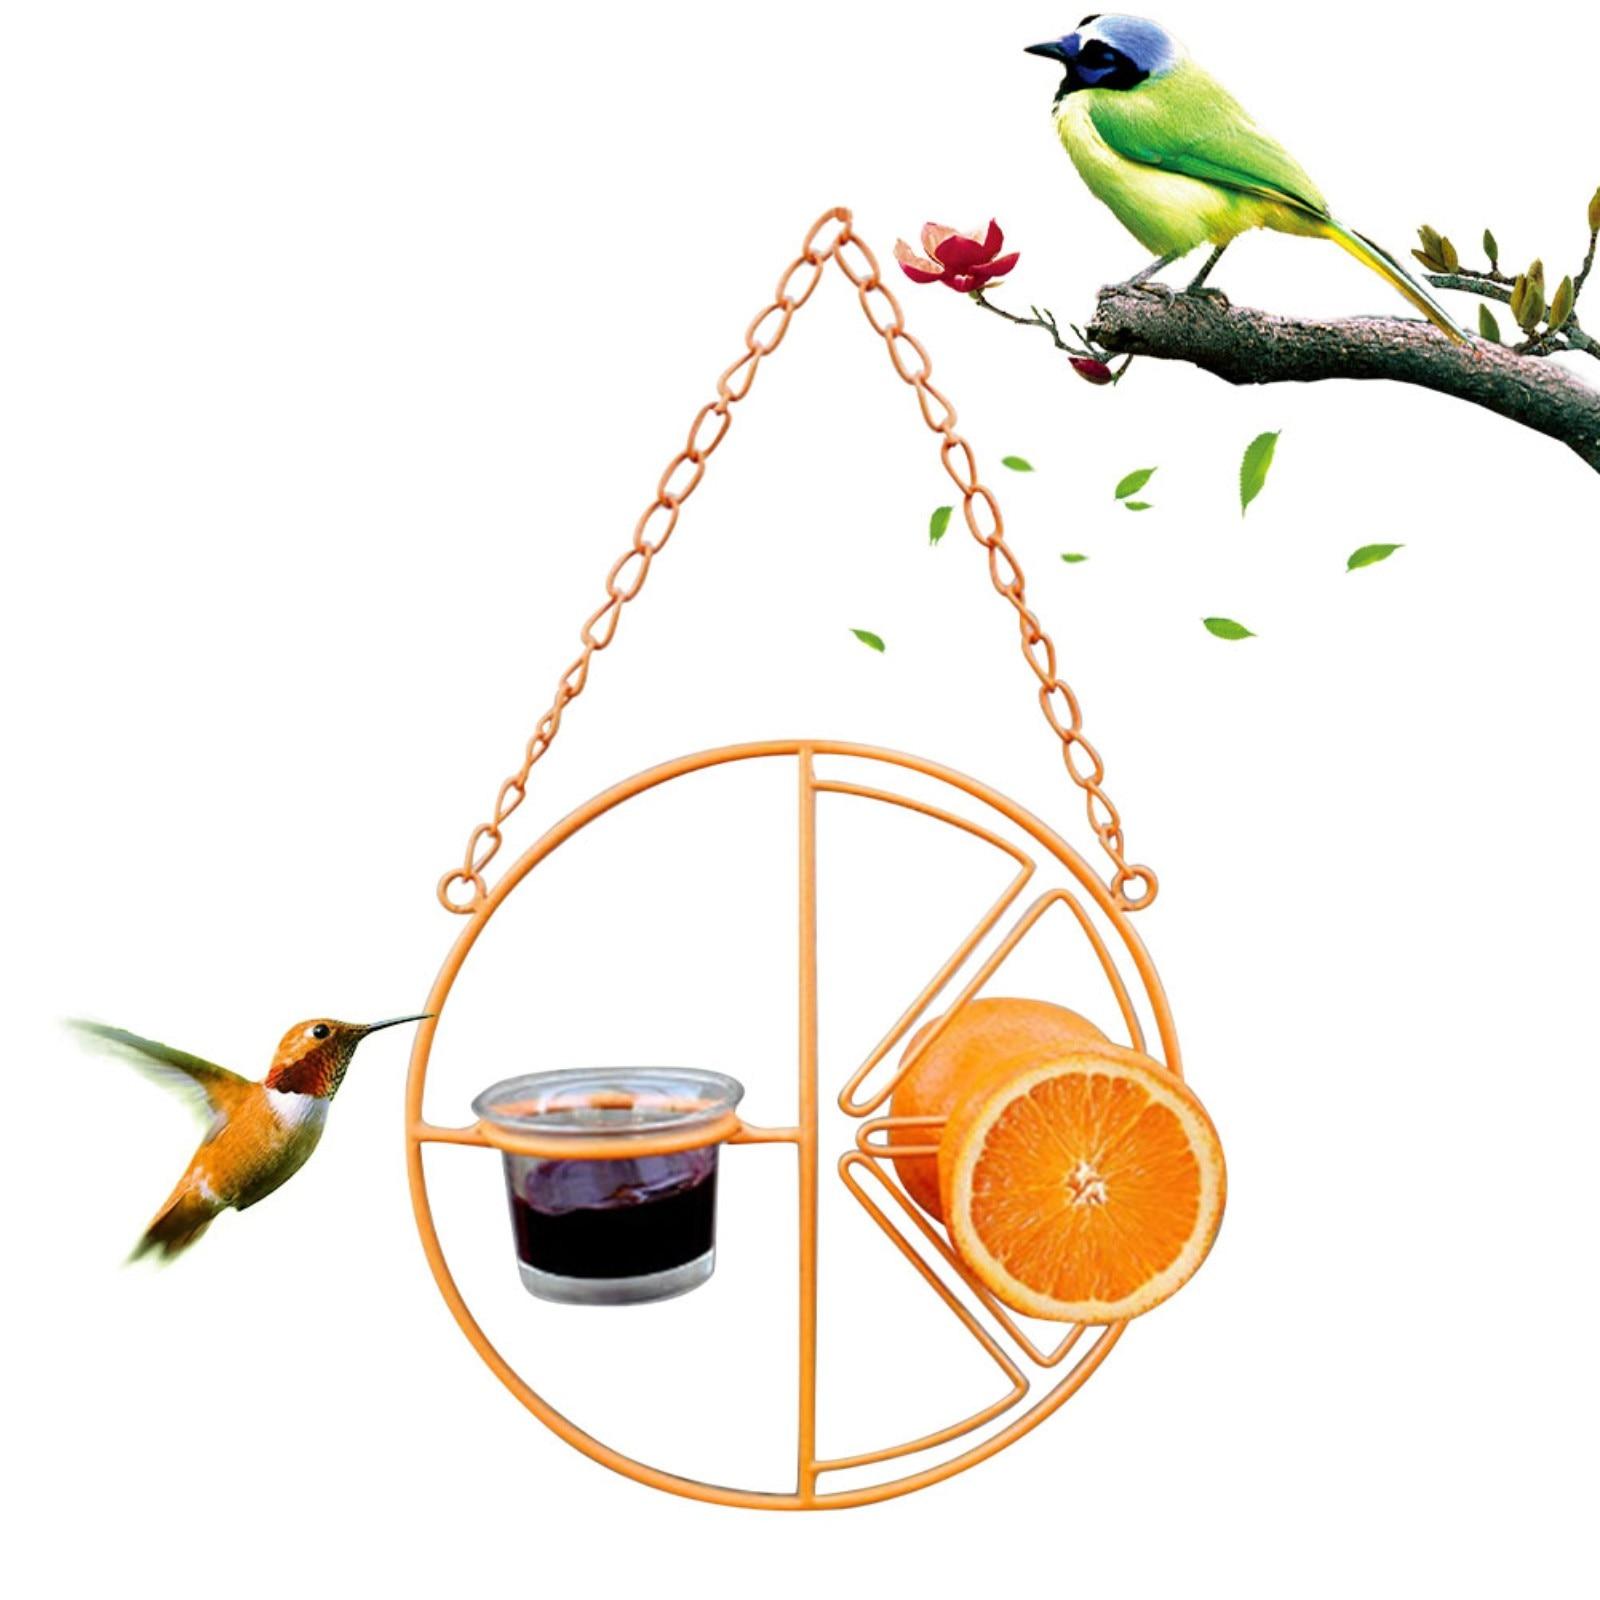 Oriole Bird Feeder Orange Fruit Outdoor Garden Metal Hanging Drinking Grape Jelly Container Farm Hummingbird Automatic Portable